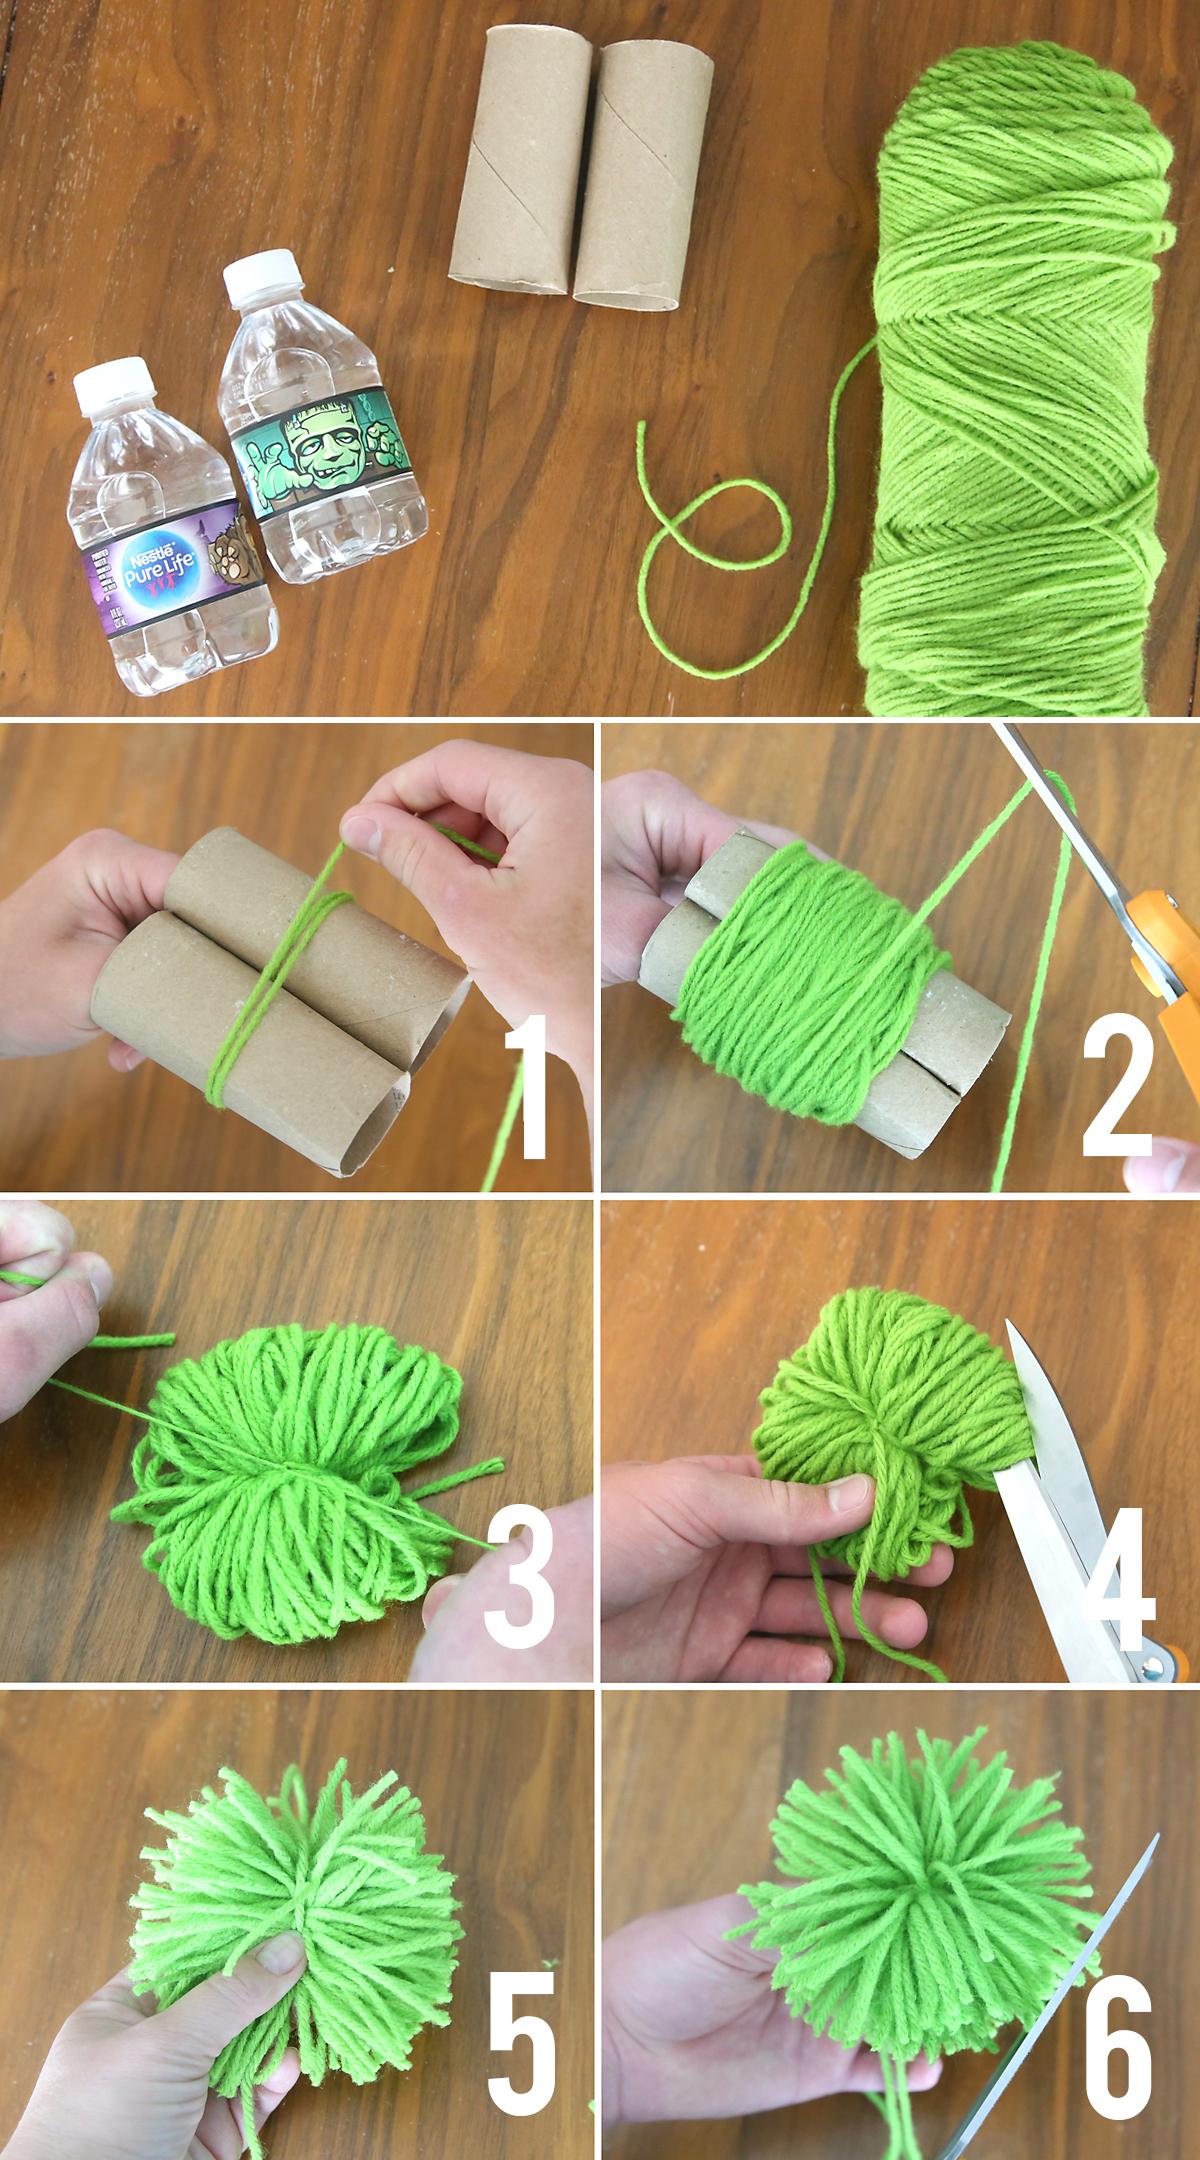 Steps for making yarn pom pom: wrap yarn around two empty toilet paper rolls, tie yarn between them, pull tie tight, snip open loops of yarn